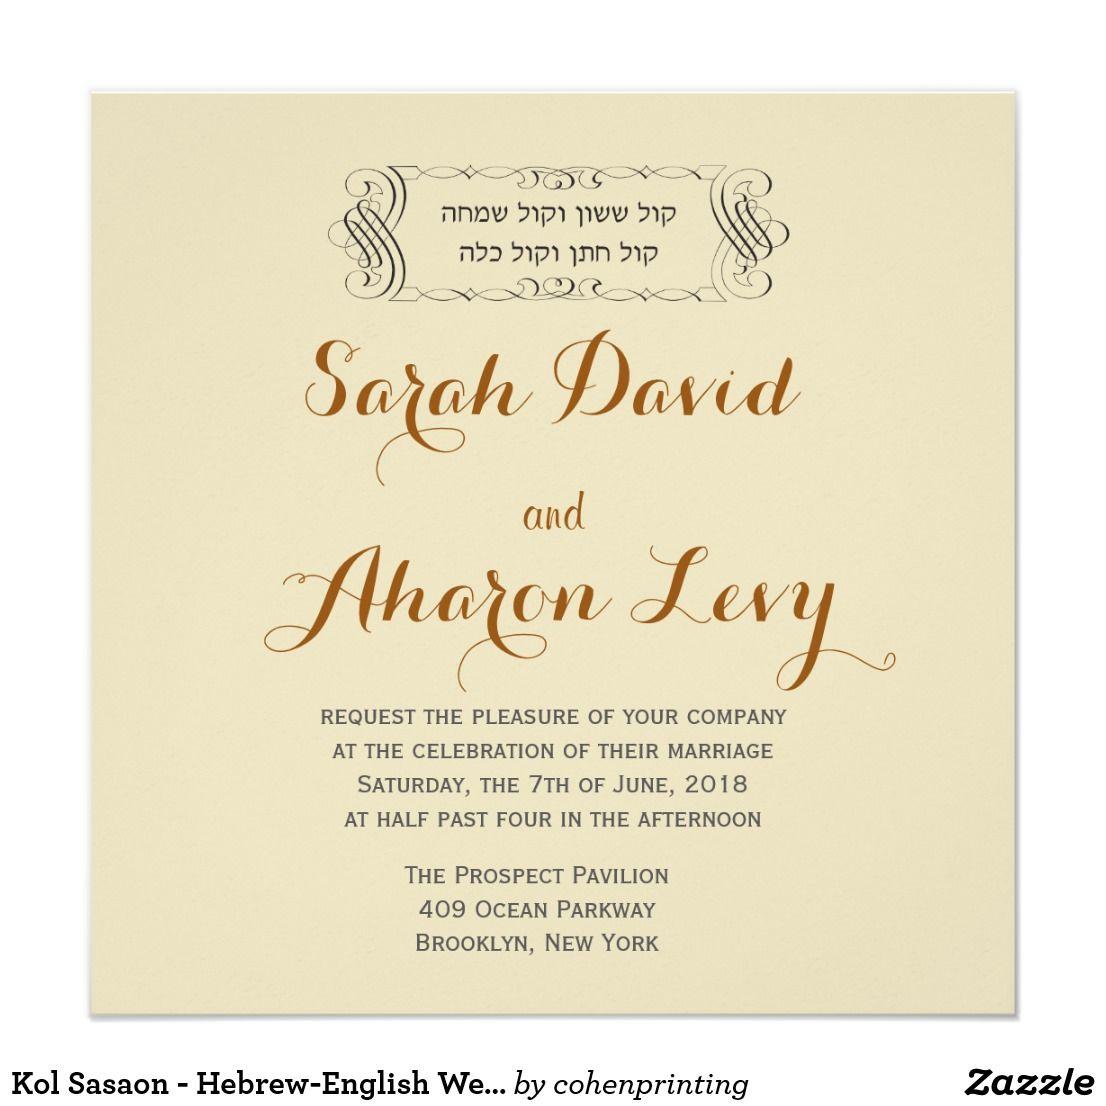 Kol Sasaon - Hebrew-English Wedding Invitation | Pinterest